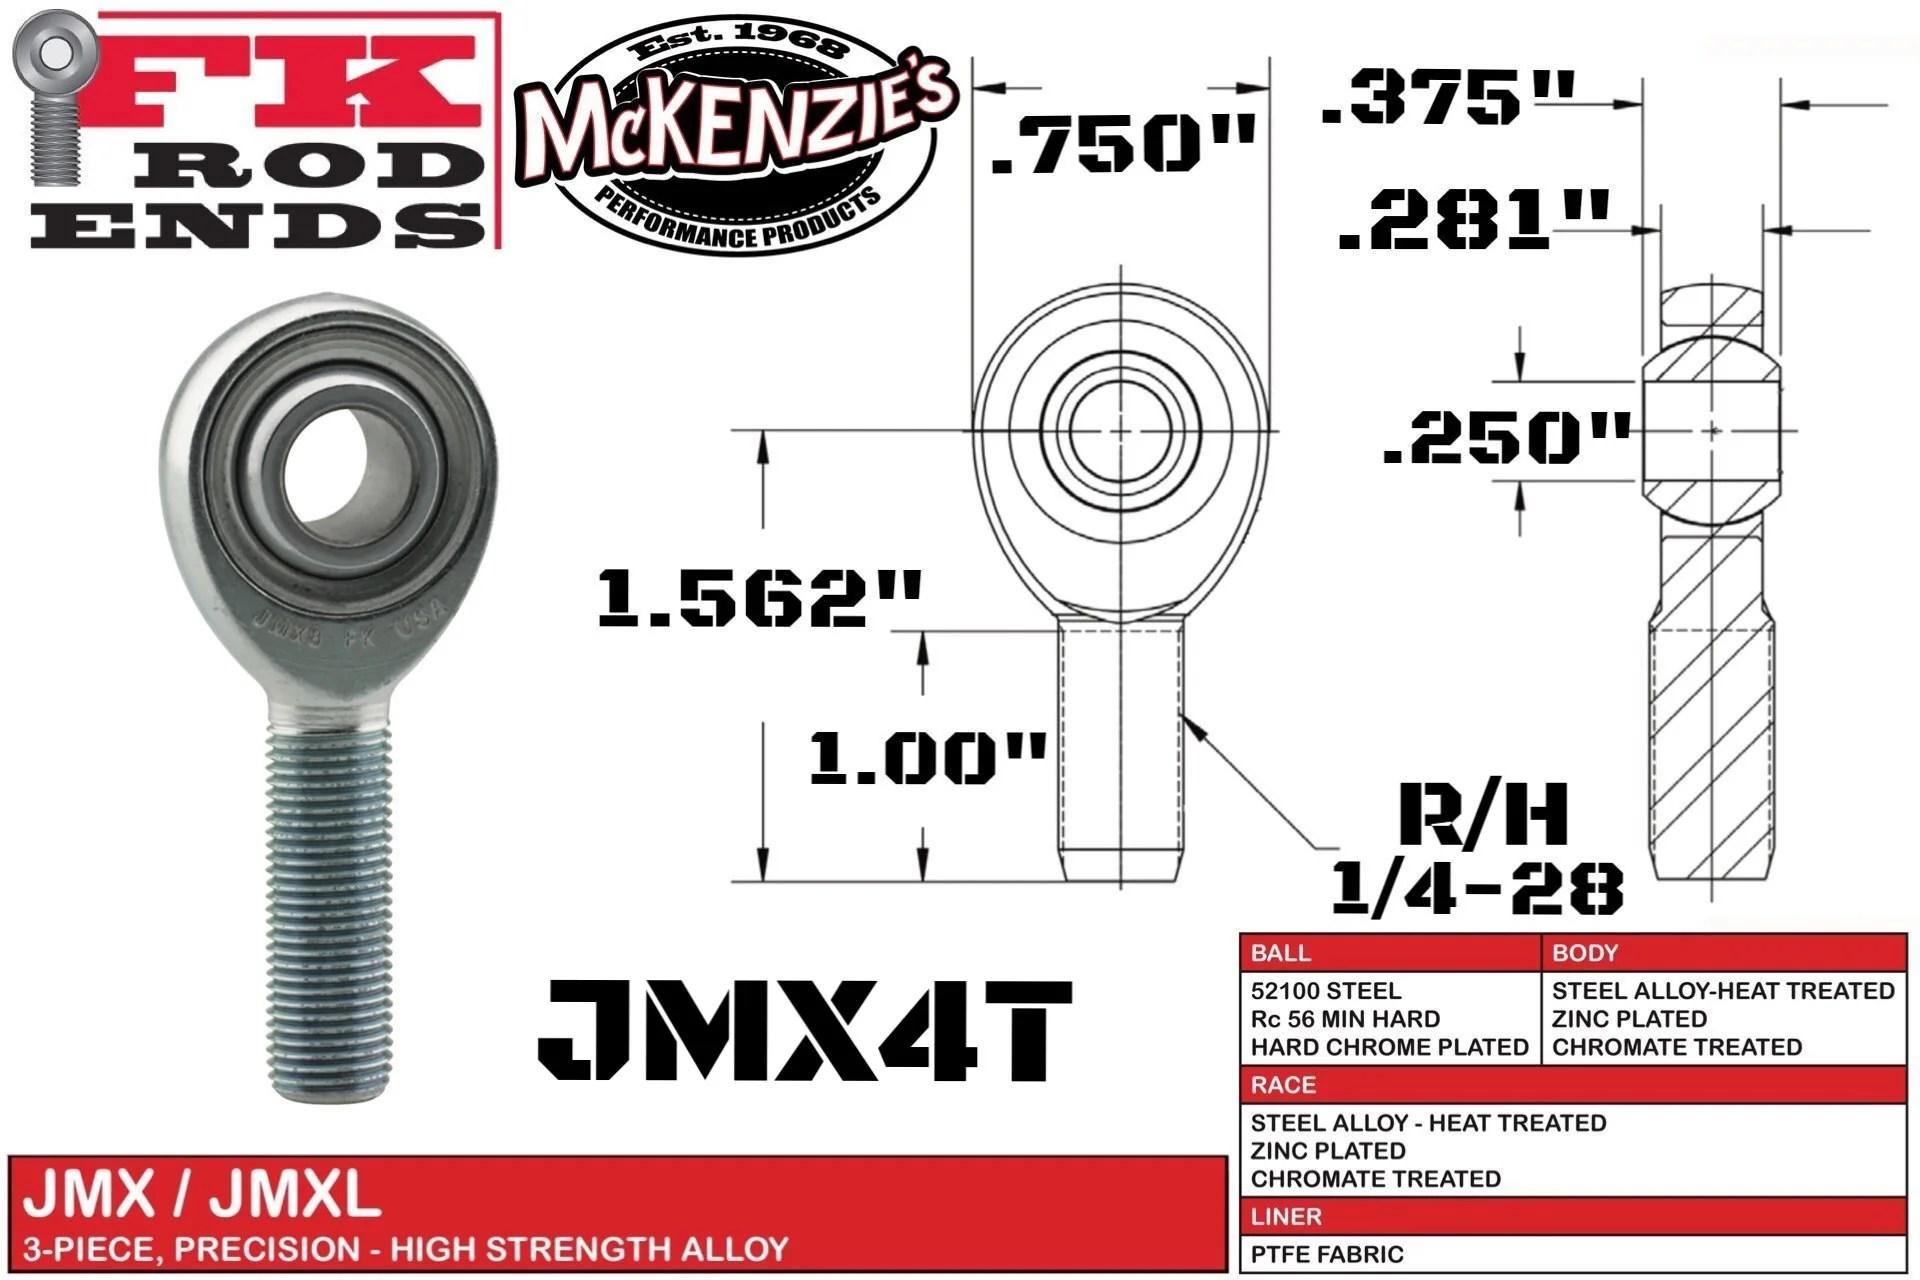 hight resolution of jmx4t male r h heim 1 4 28 thread 250 ball fk bearing